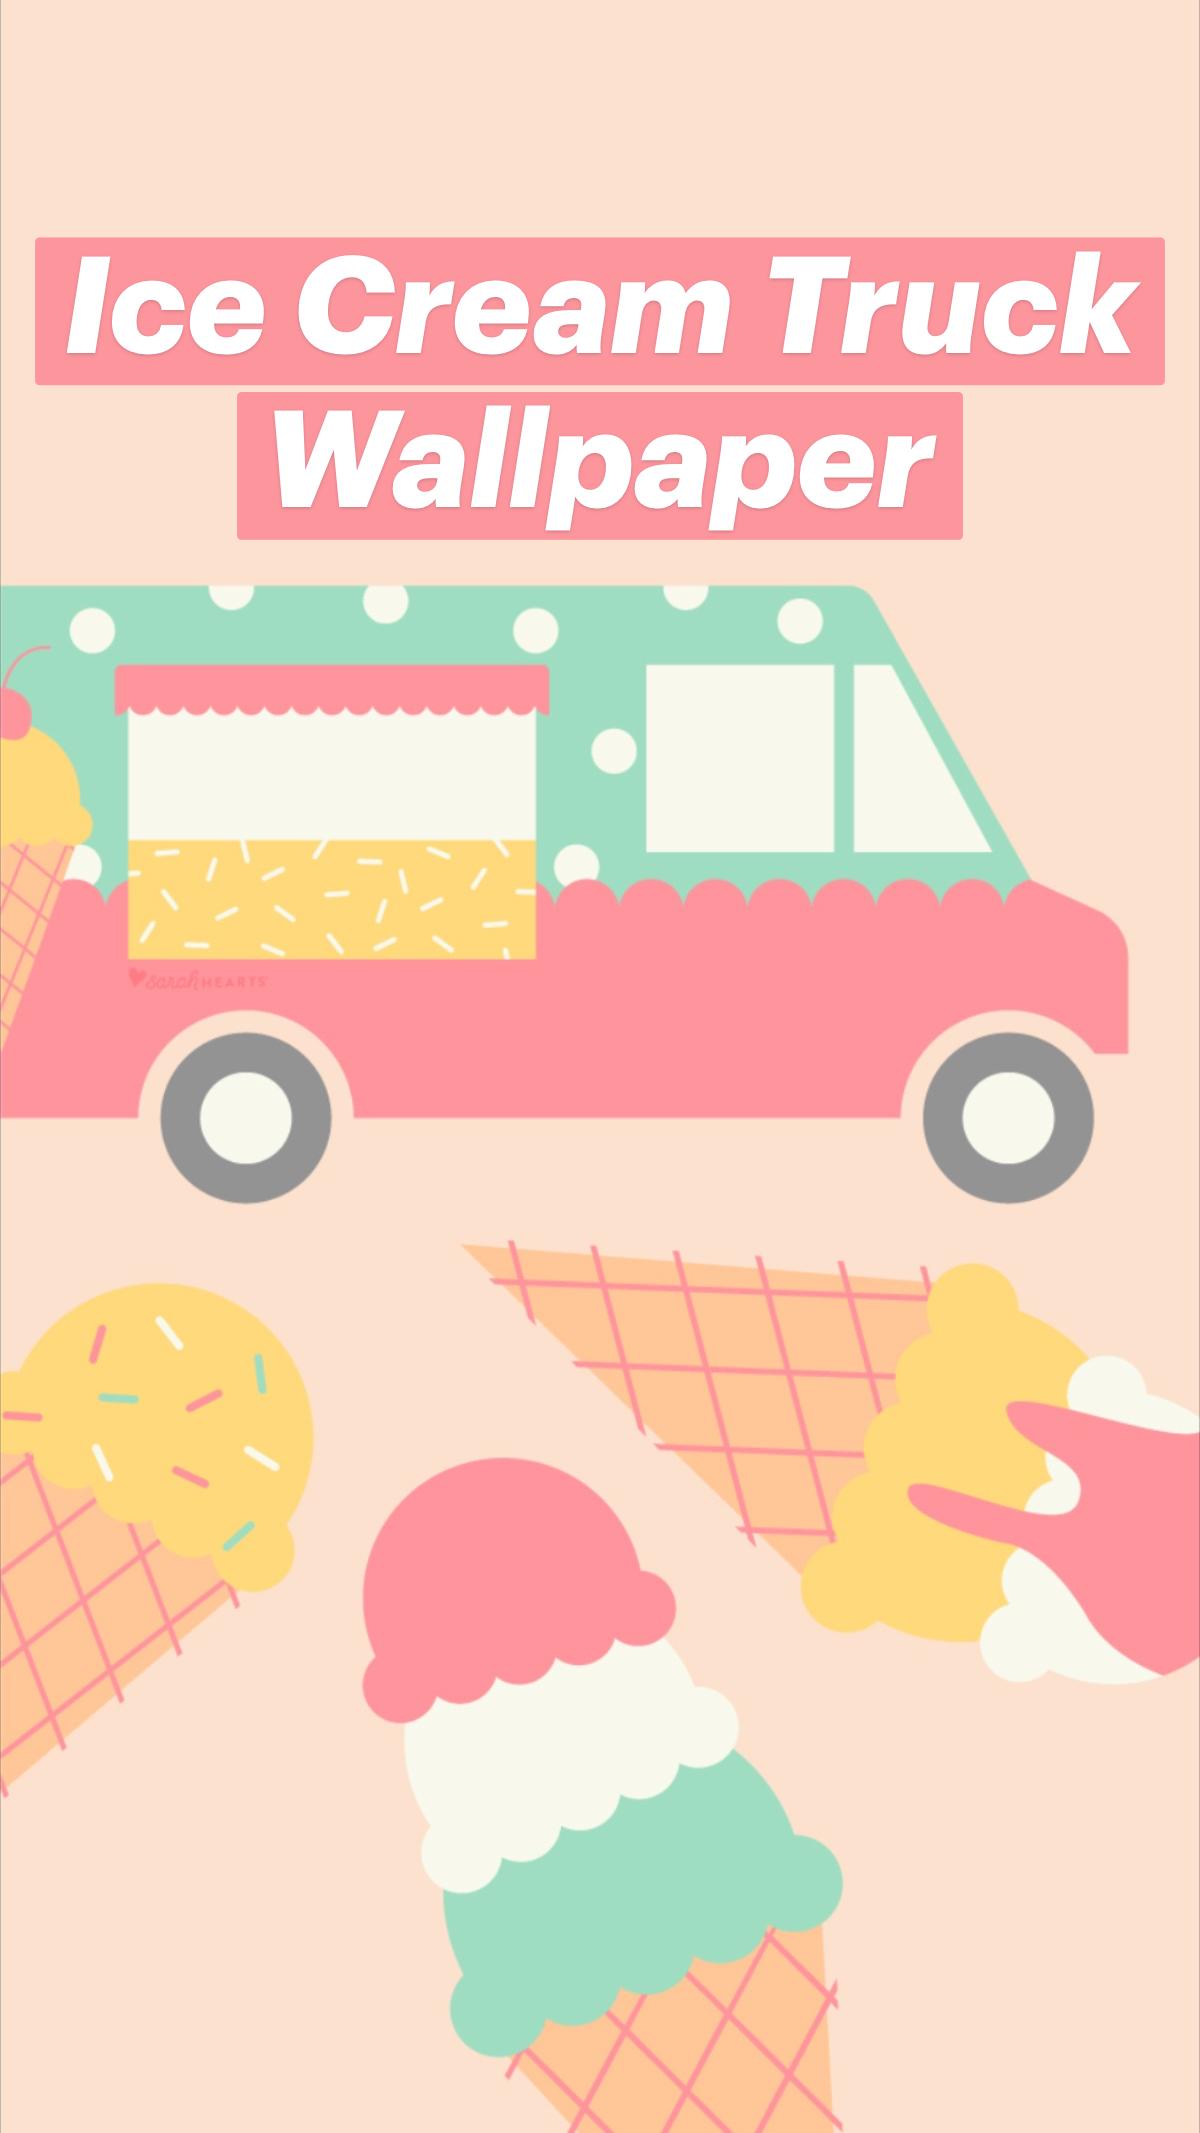 Ice Cream Truck Wallpaper